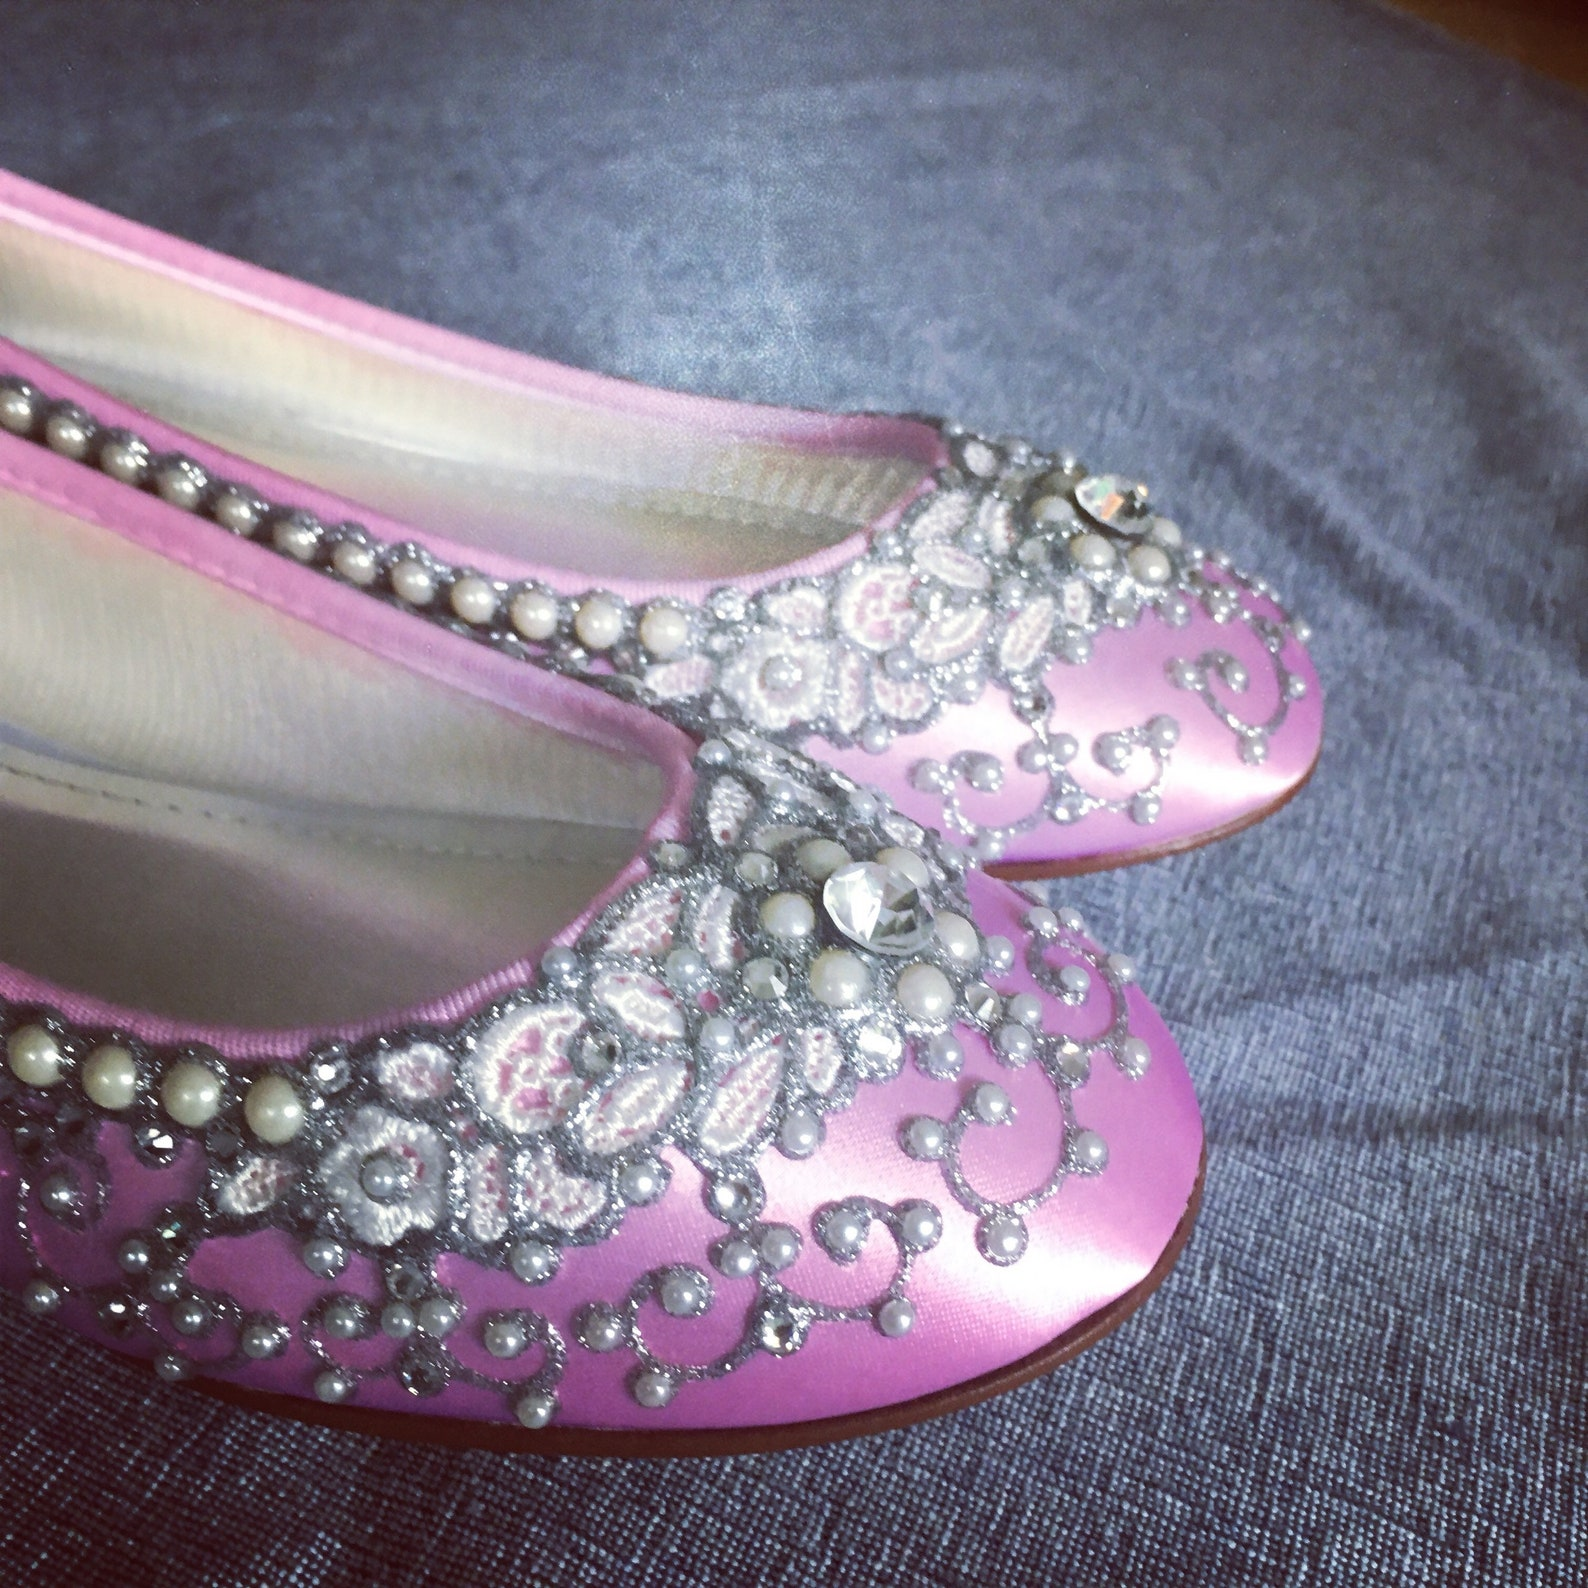 sale - size 8 candy pink satin cinderella ballet flats